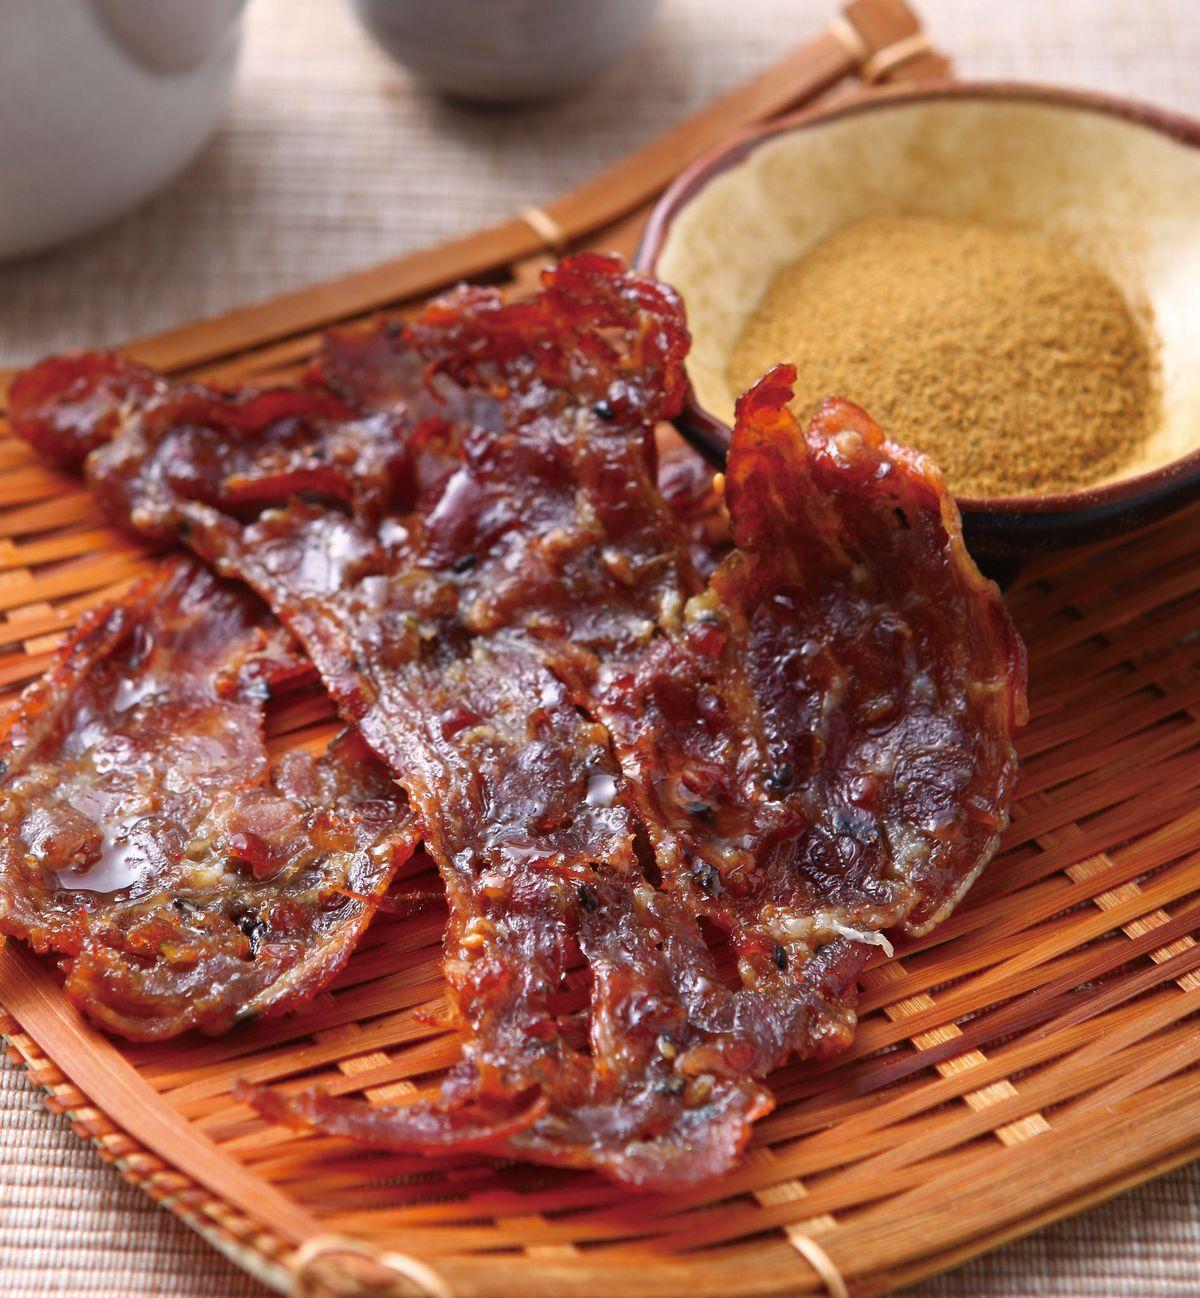 食譜:羊肉脆片